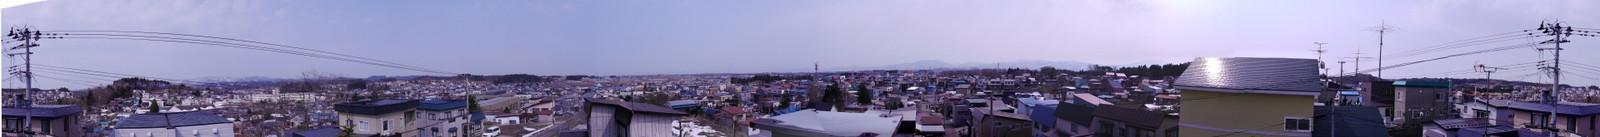 P1330831_panorama